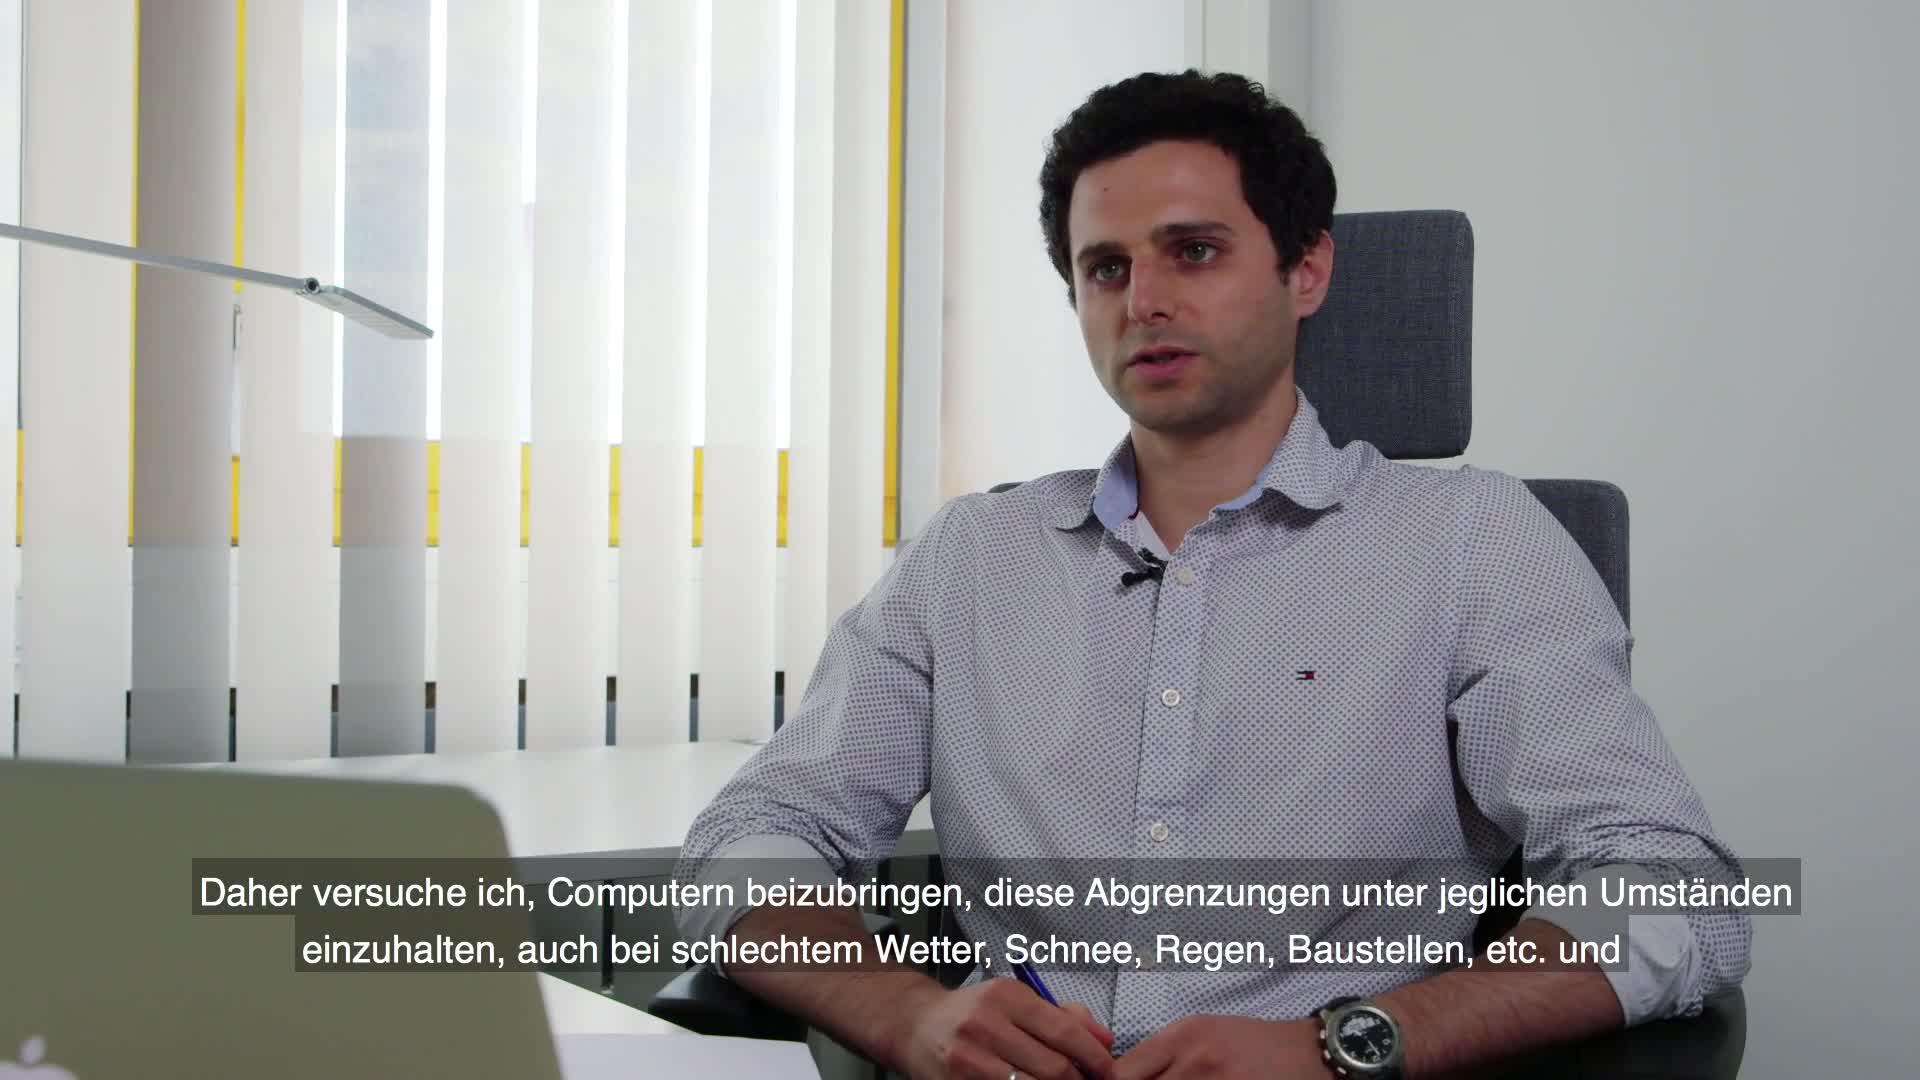 Prof. Dr. Veniamin Morgenshtern - Multimediakommunikation und Signalverarbeitung preview image